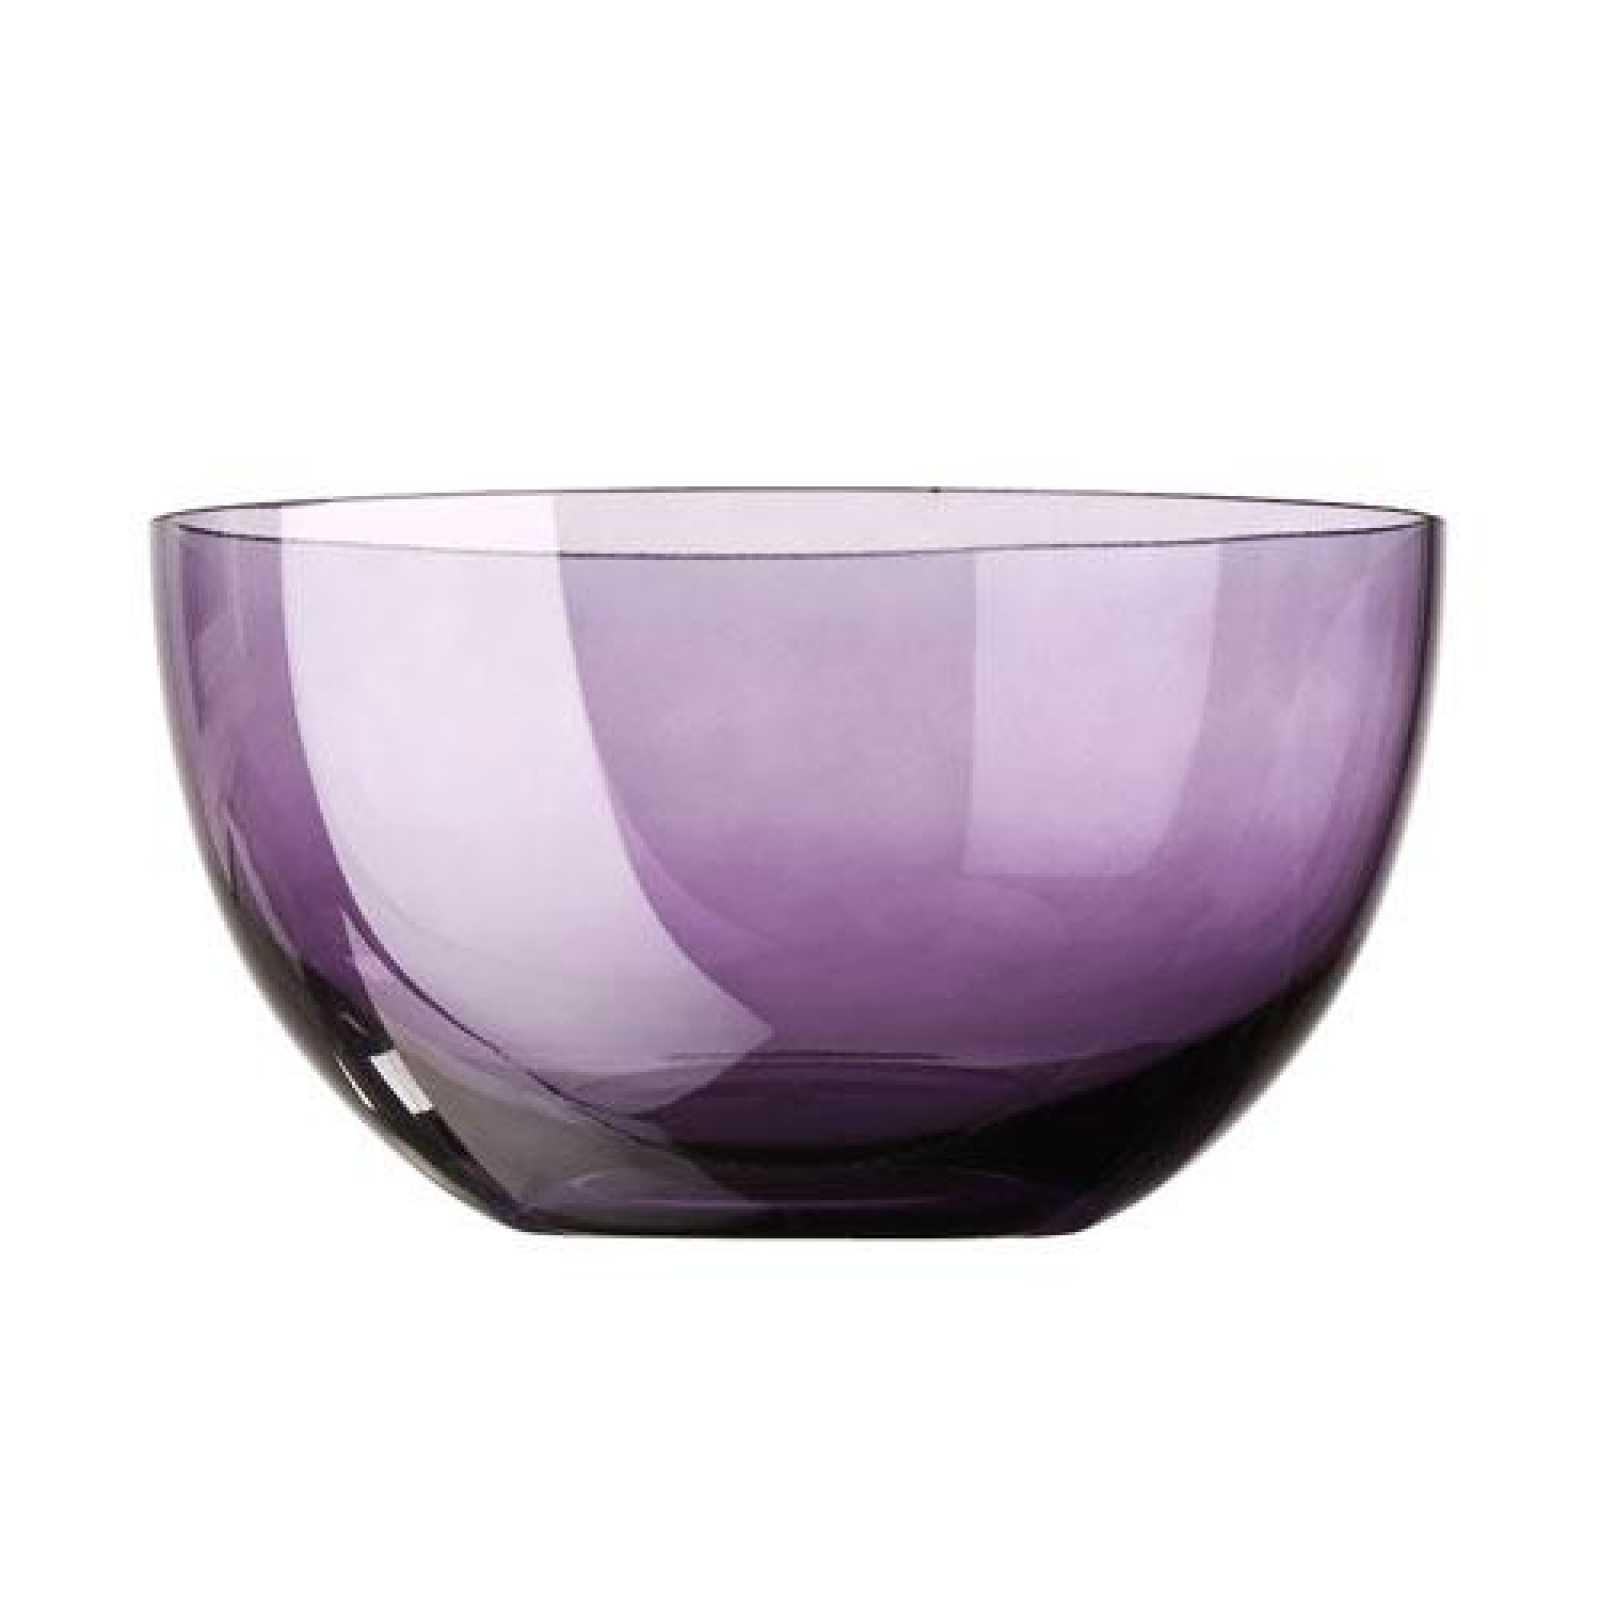 Онлайн каталог PROMENU: Салатник стеклянный Rosenthal SUNNY DAY, диаметр 22 см, фиолетовый Rosenthal 69034-408531-45322